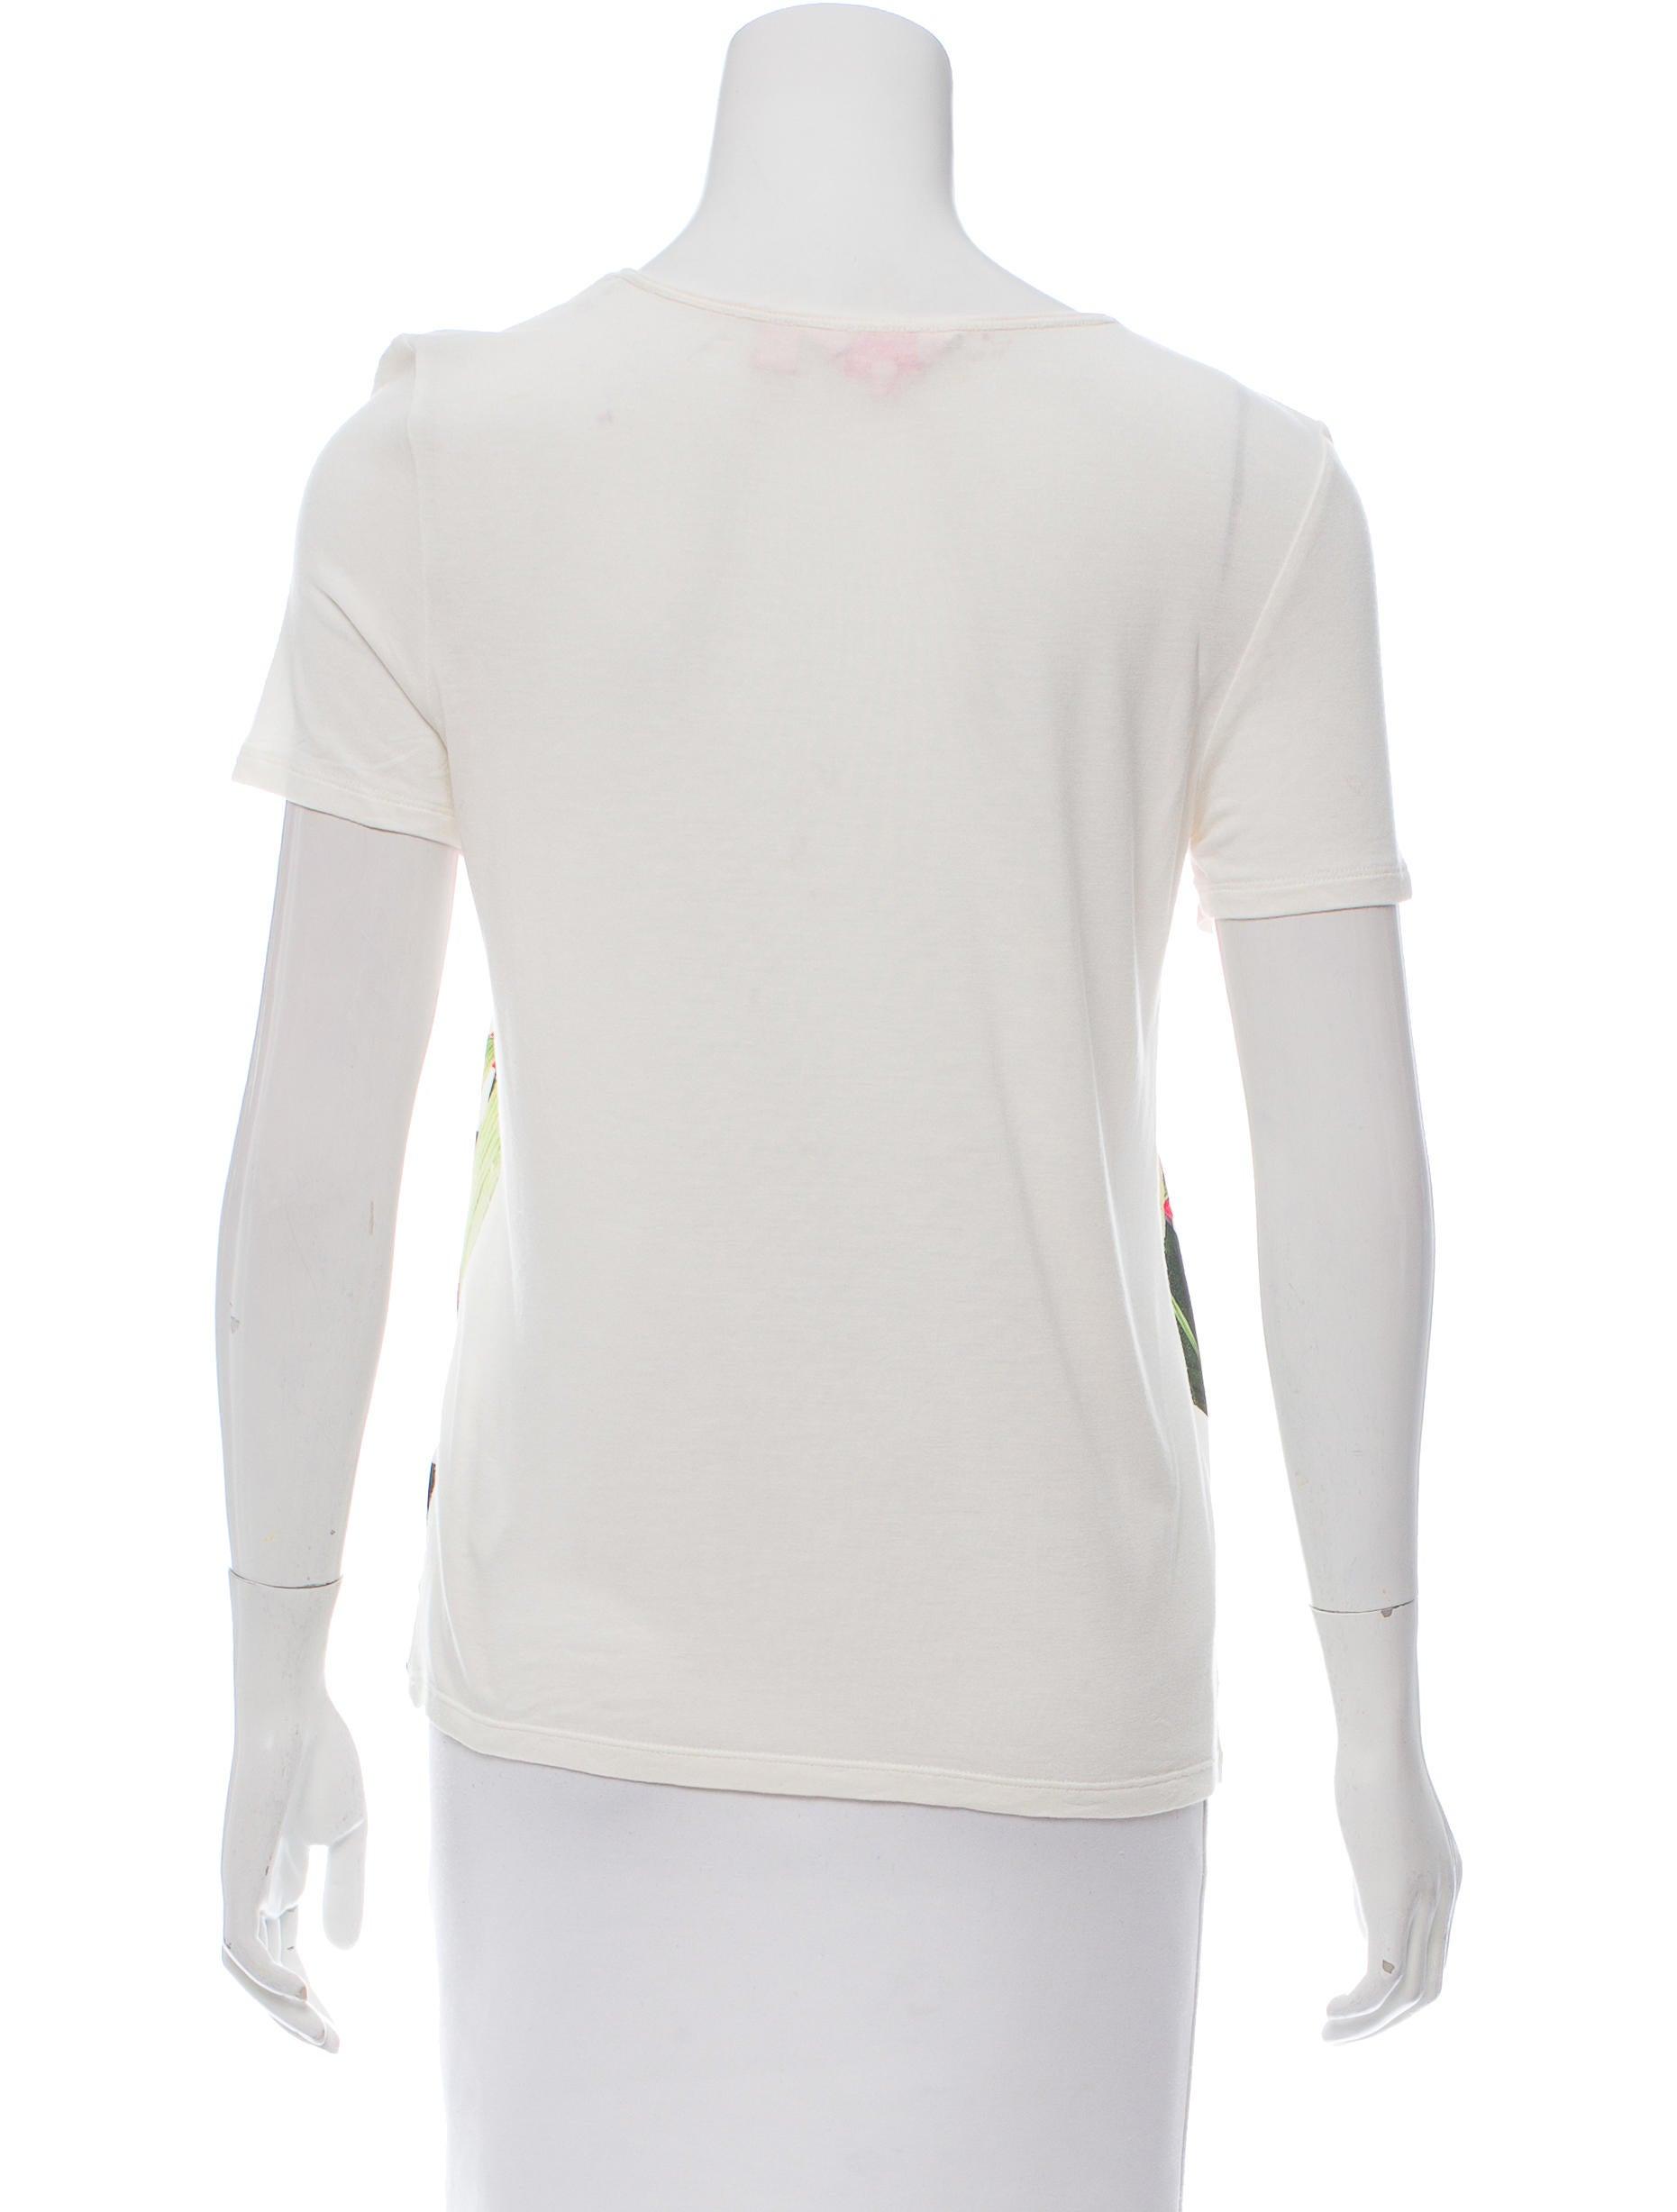 Ted baker floral printed short sleeve t shirt clothing for Ted baker floral print shirt